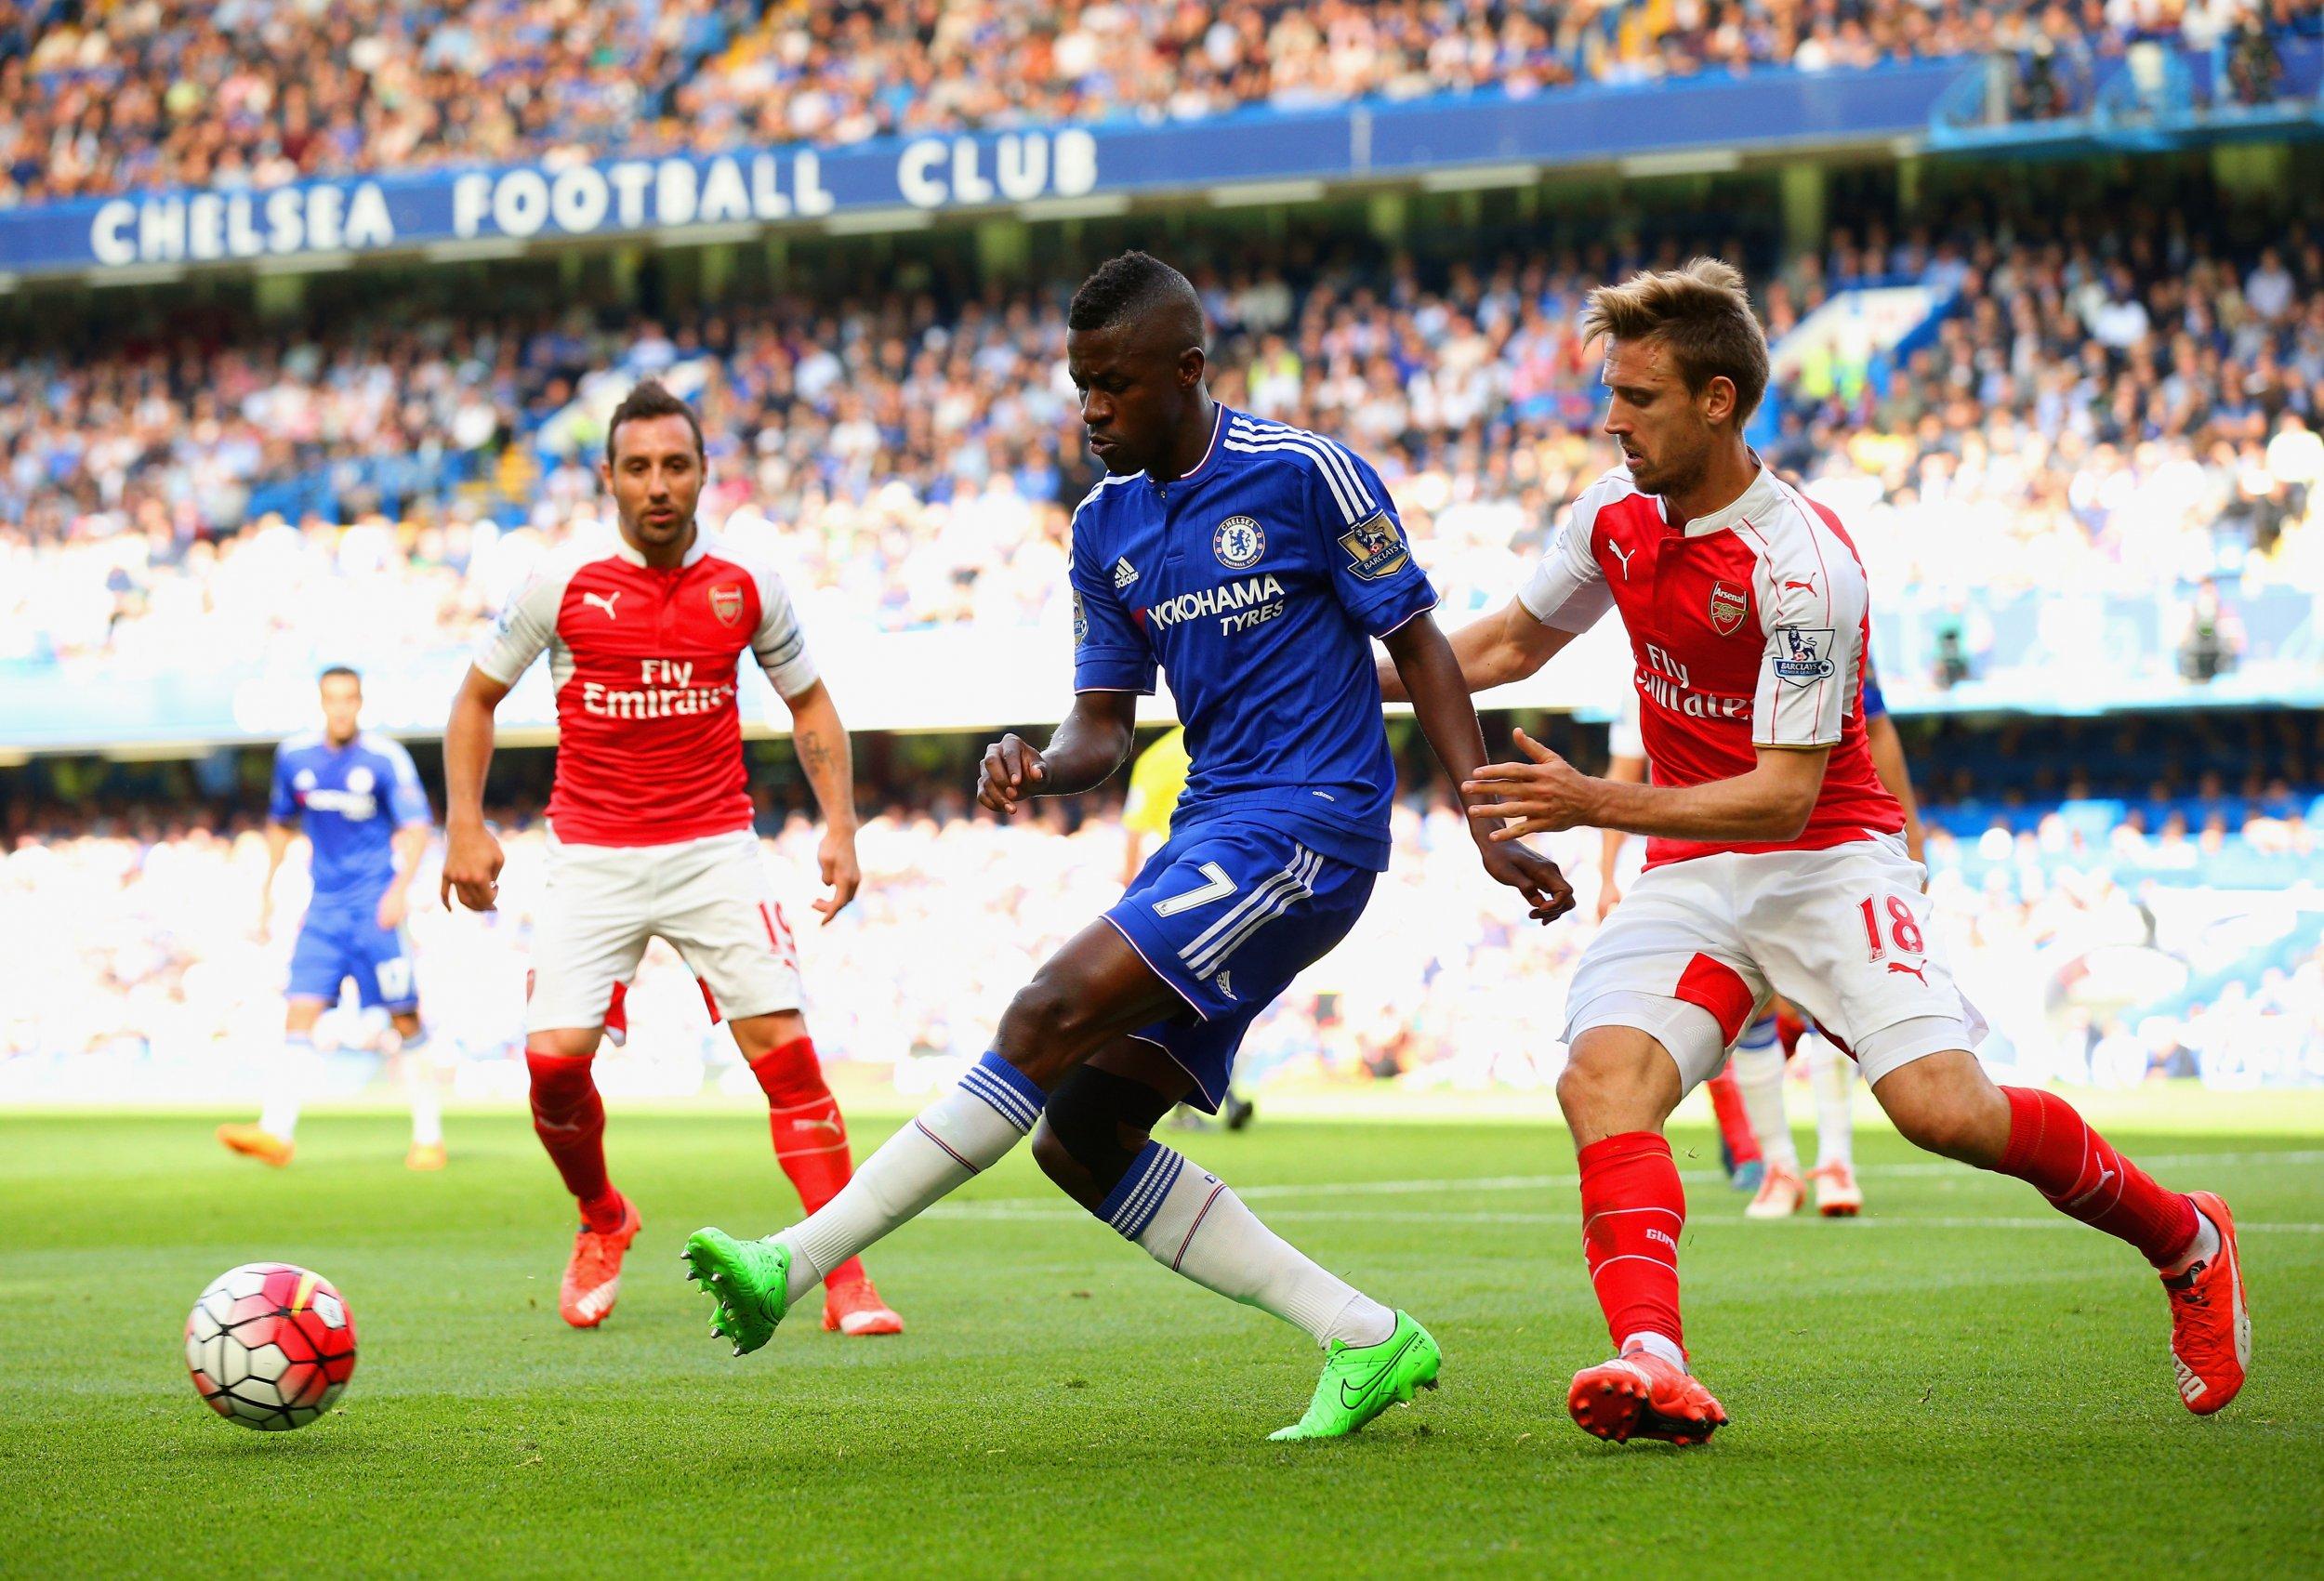 Chelsea Transfer News Why is Ramires on his way to Jiangsu Suning